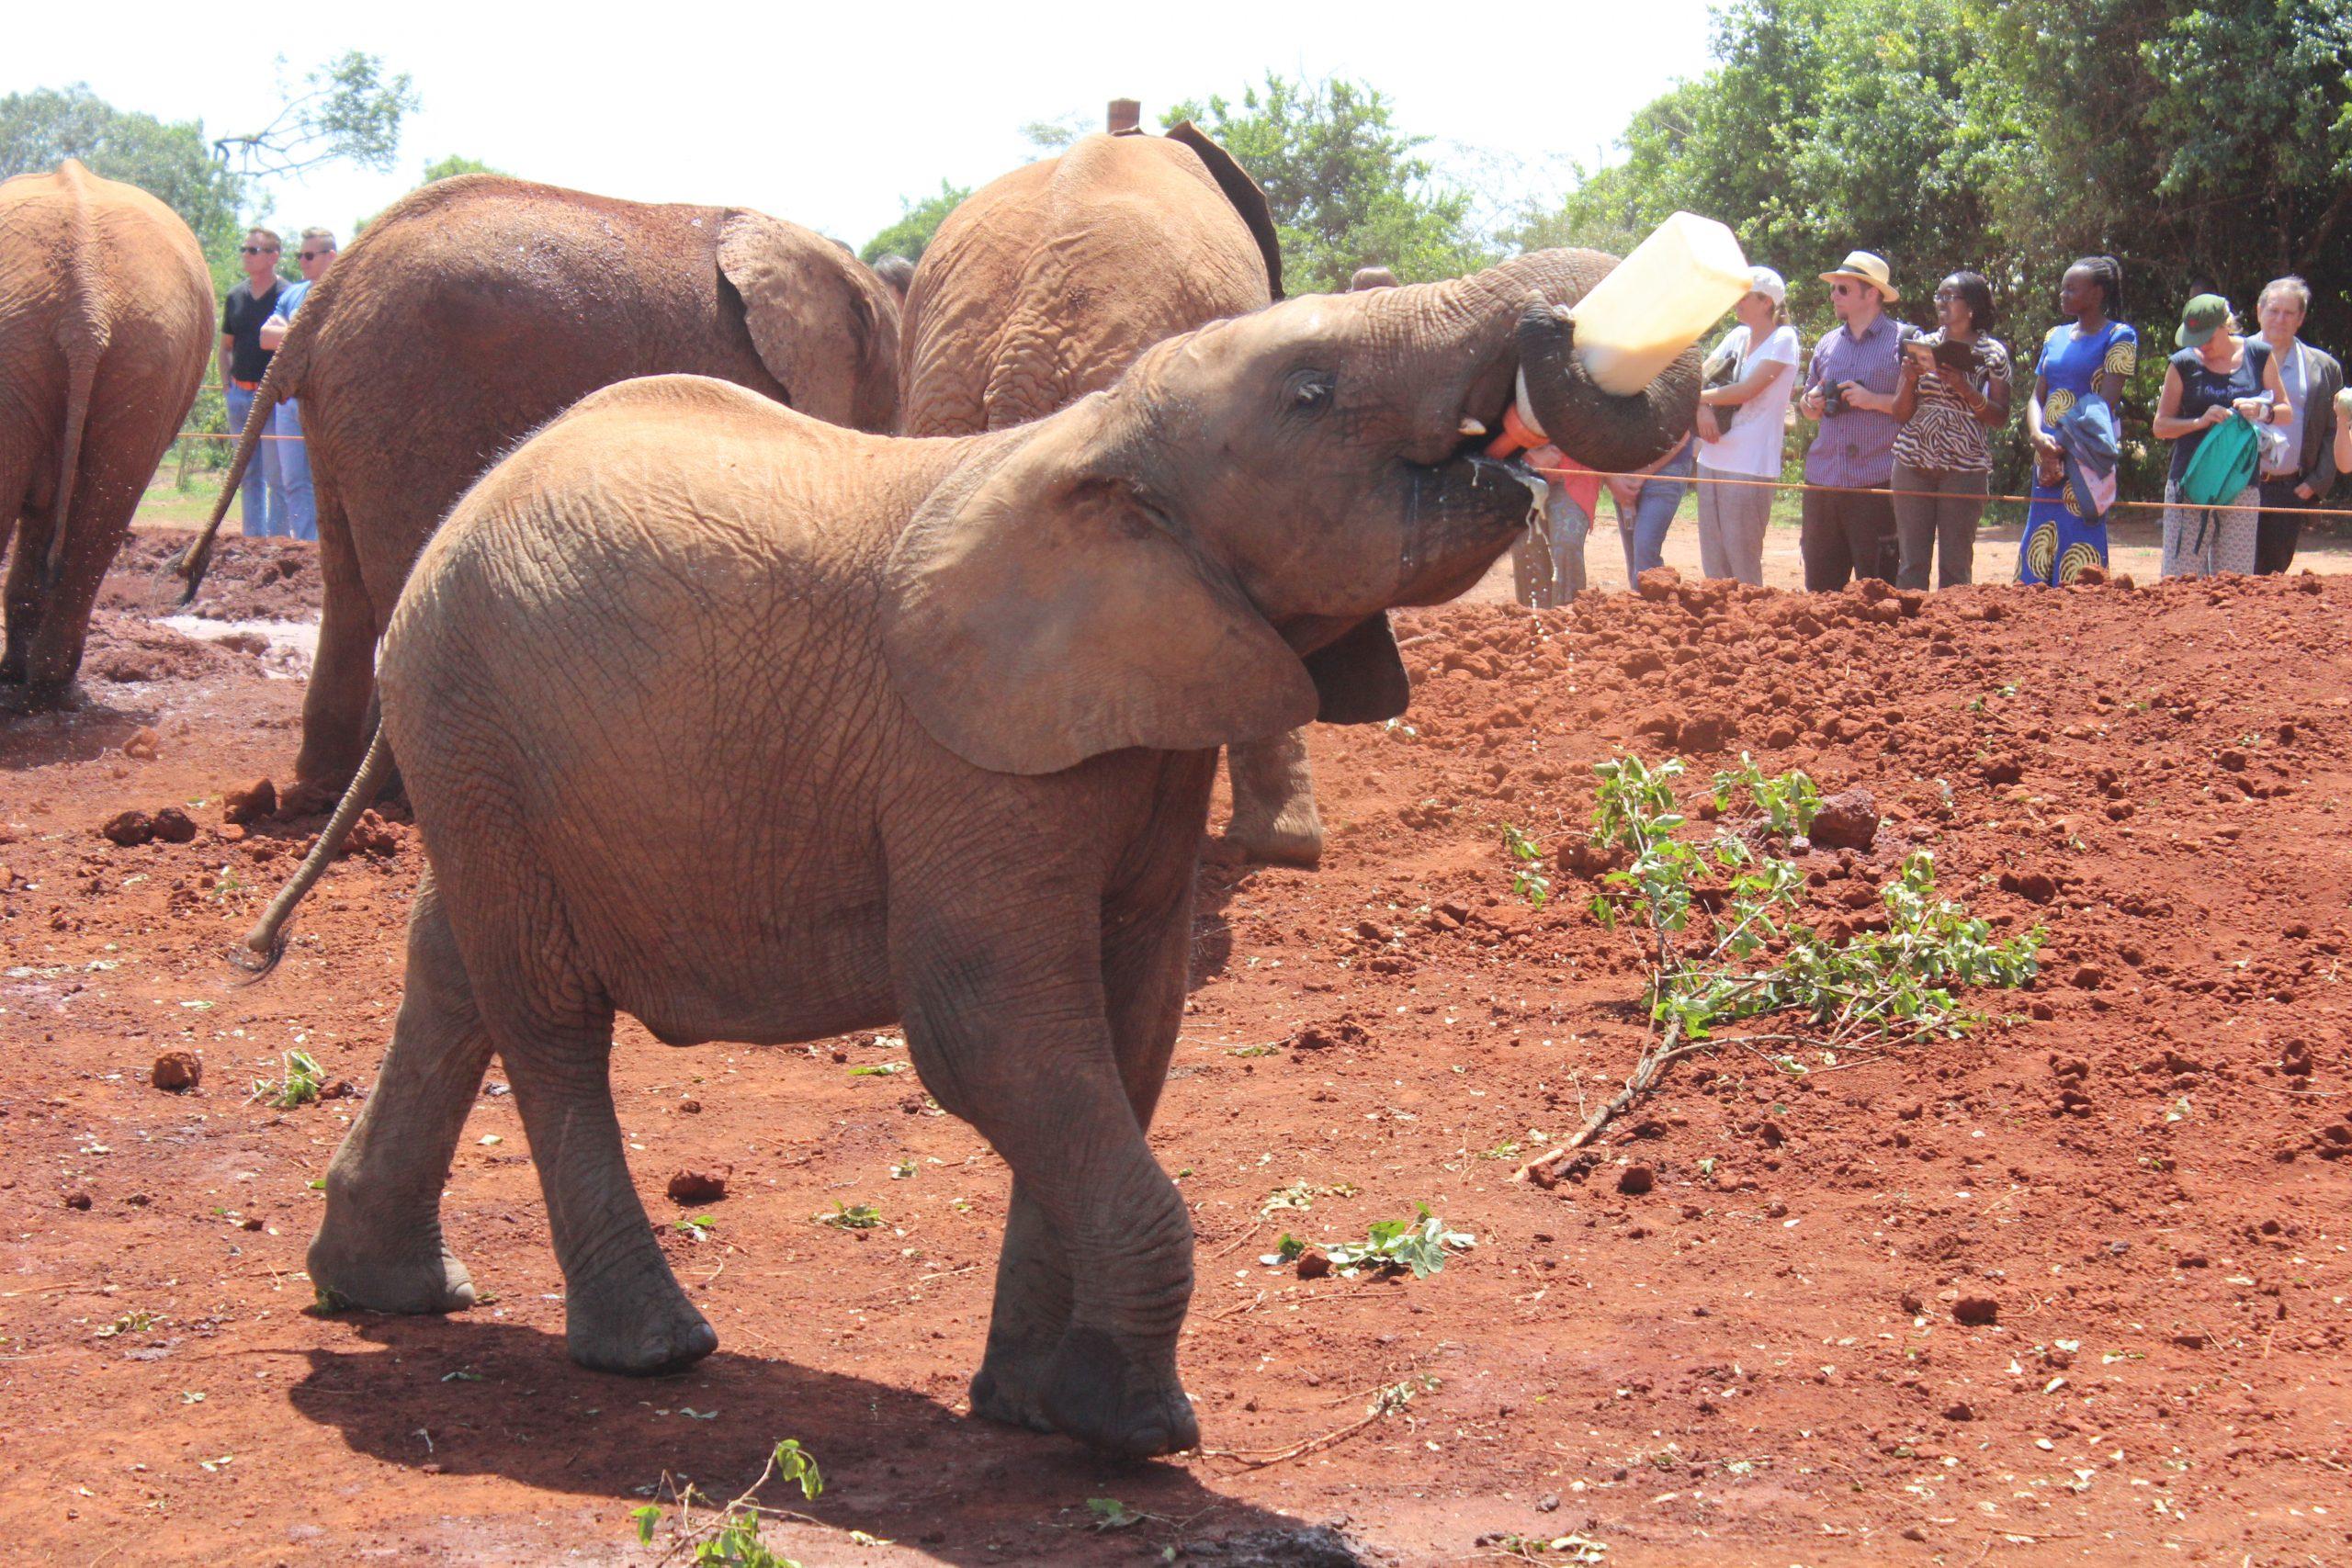 viajar a kenia con niños